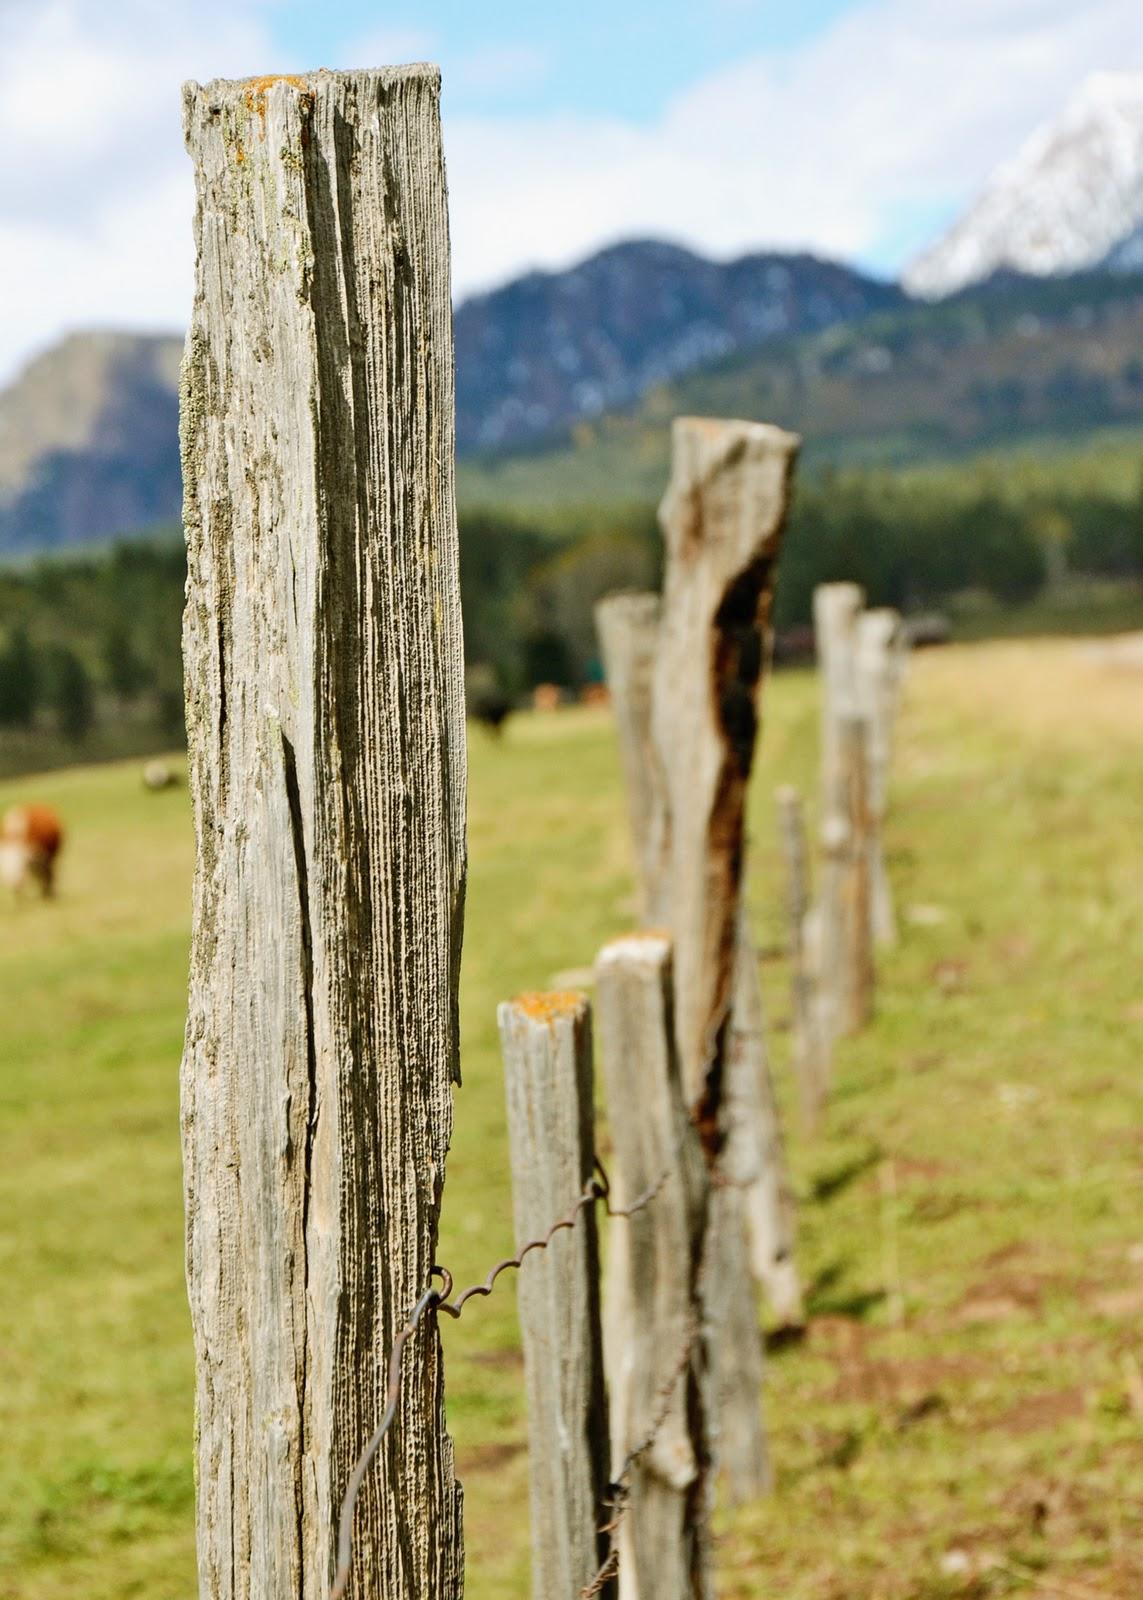 fence+post.jpg